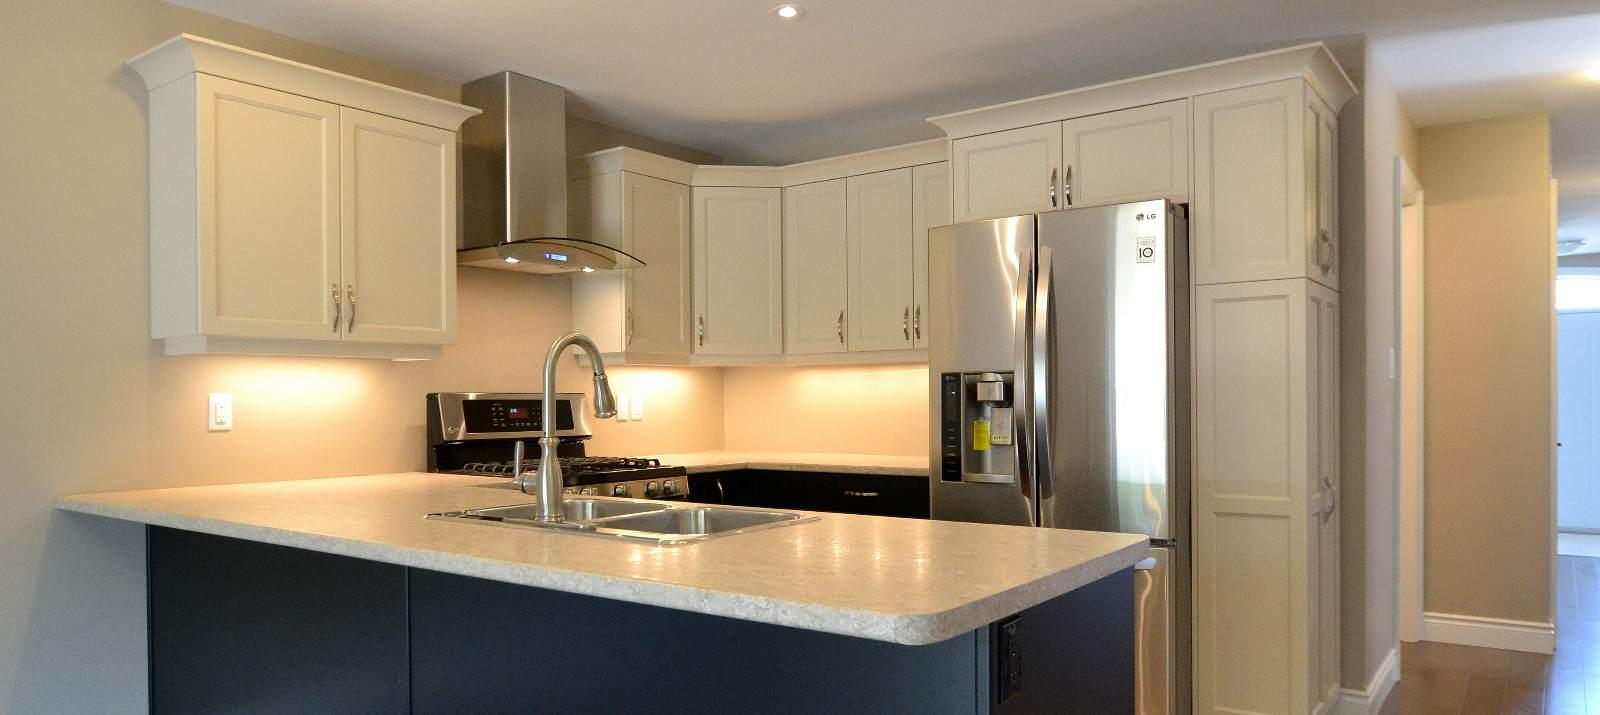 WEBIMAGES: 1600x715 jon kitchen2.jpg